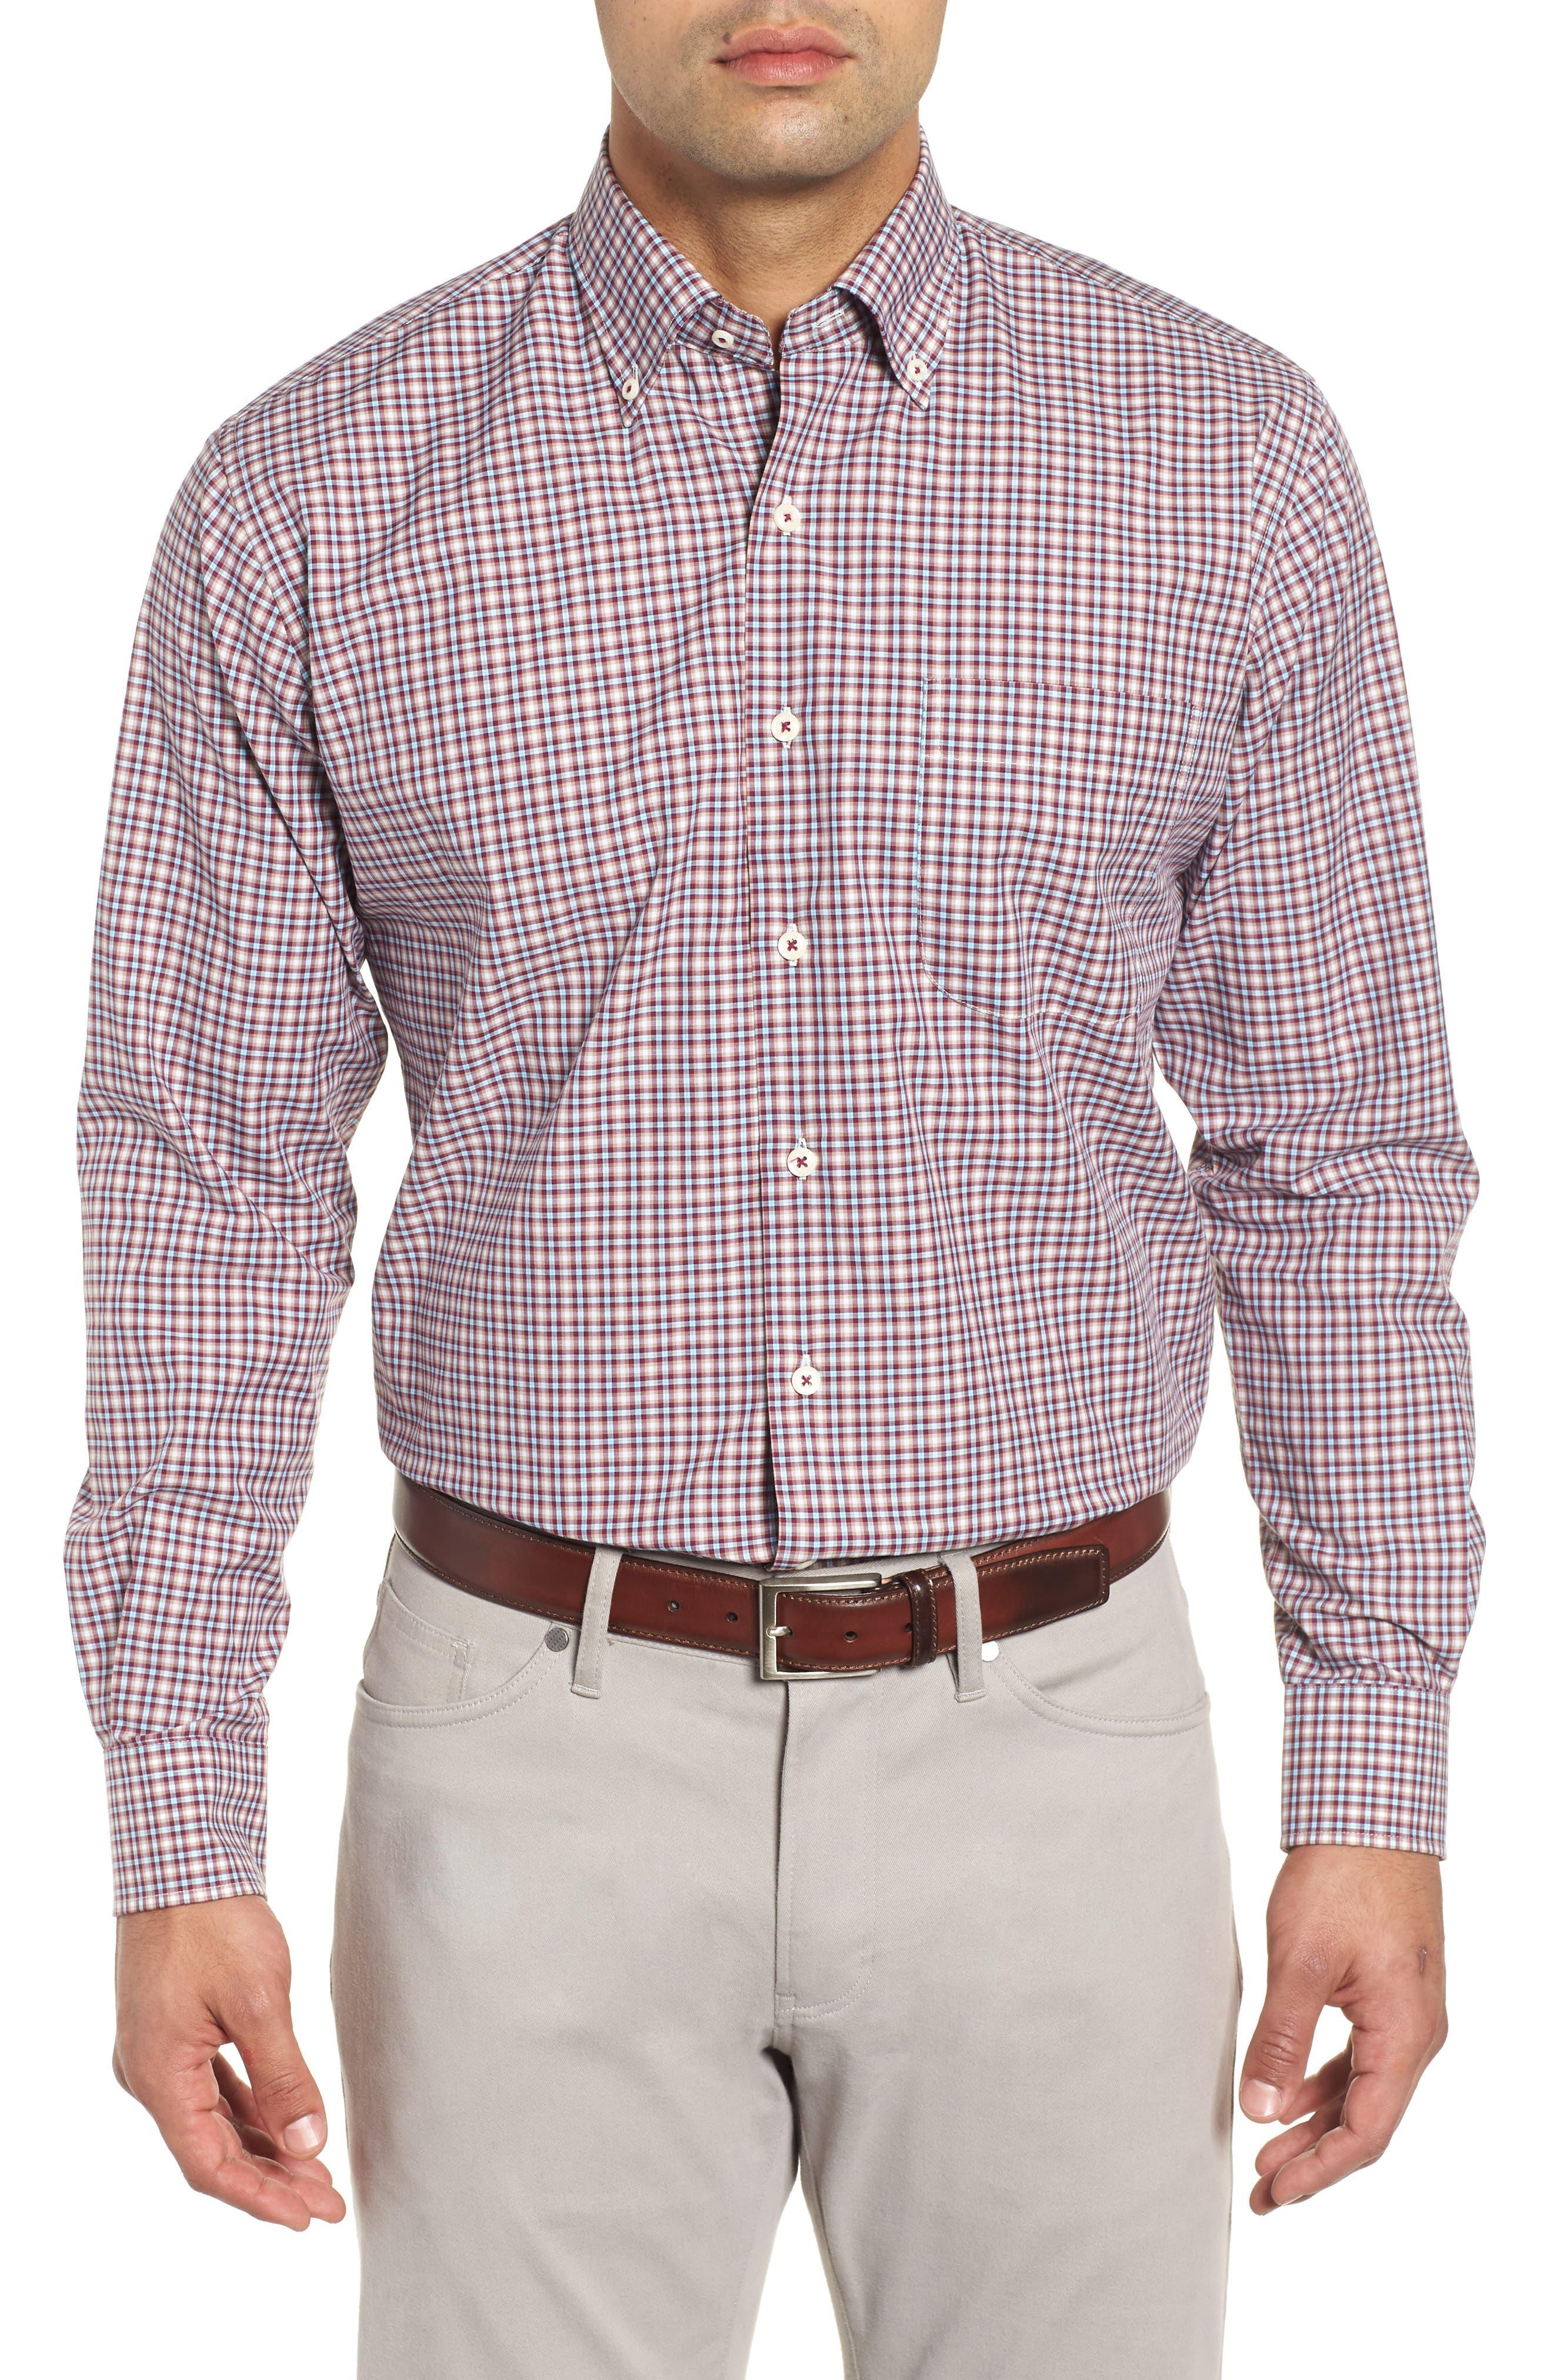 Albertville Check Sport Shirt,                         Main,                         color, WINTERBERRY